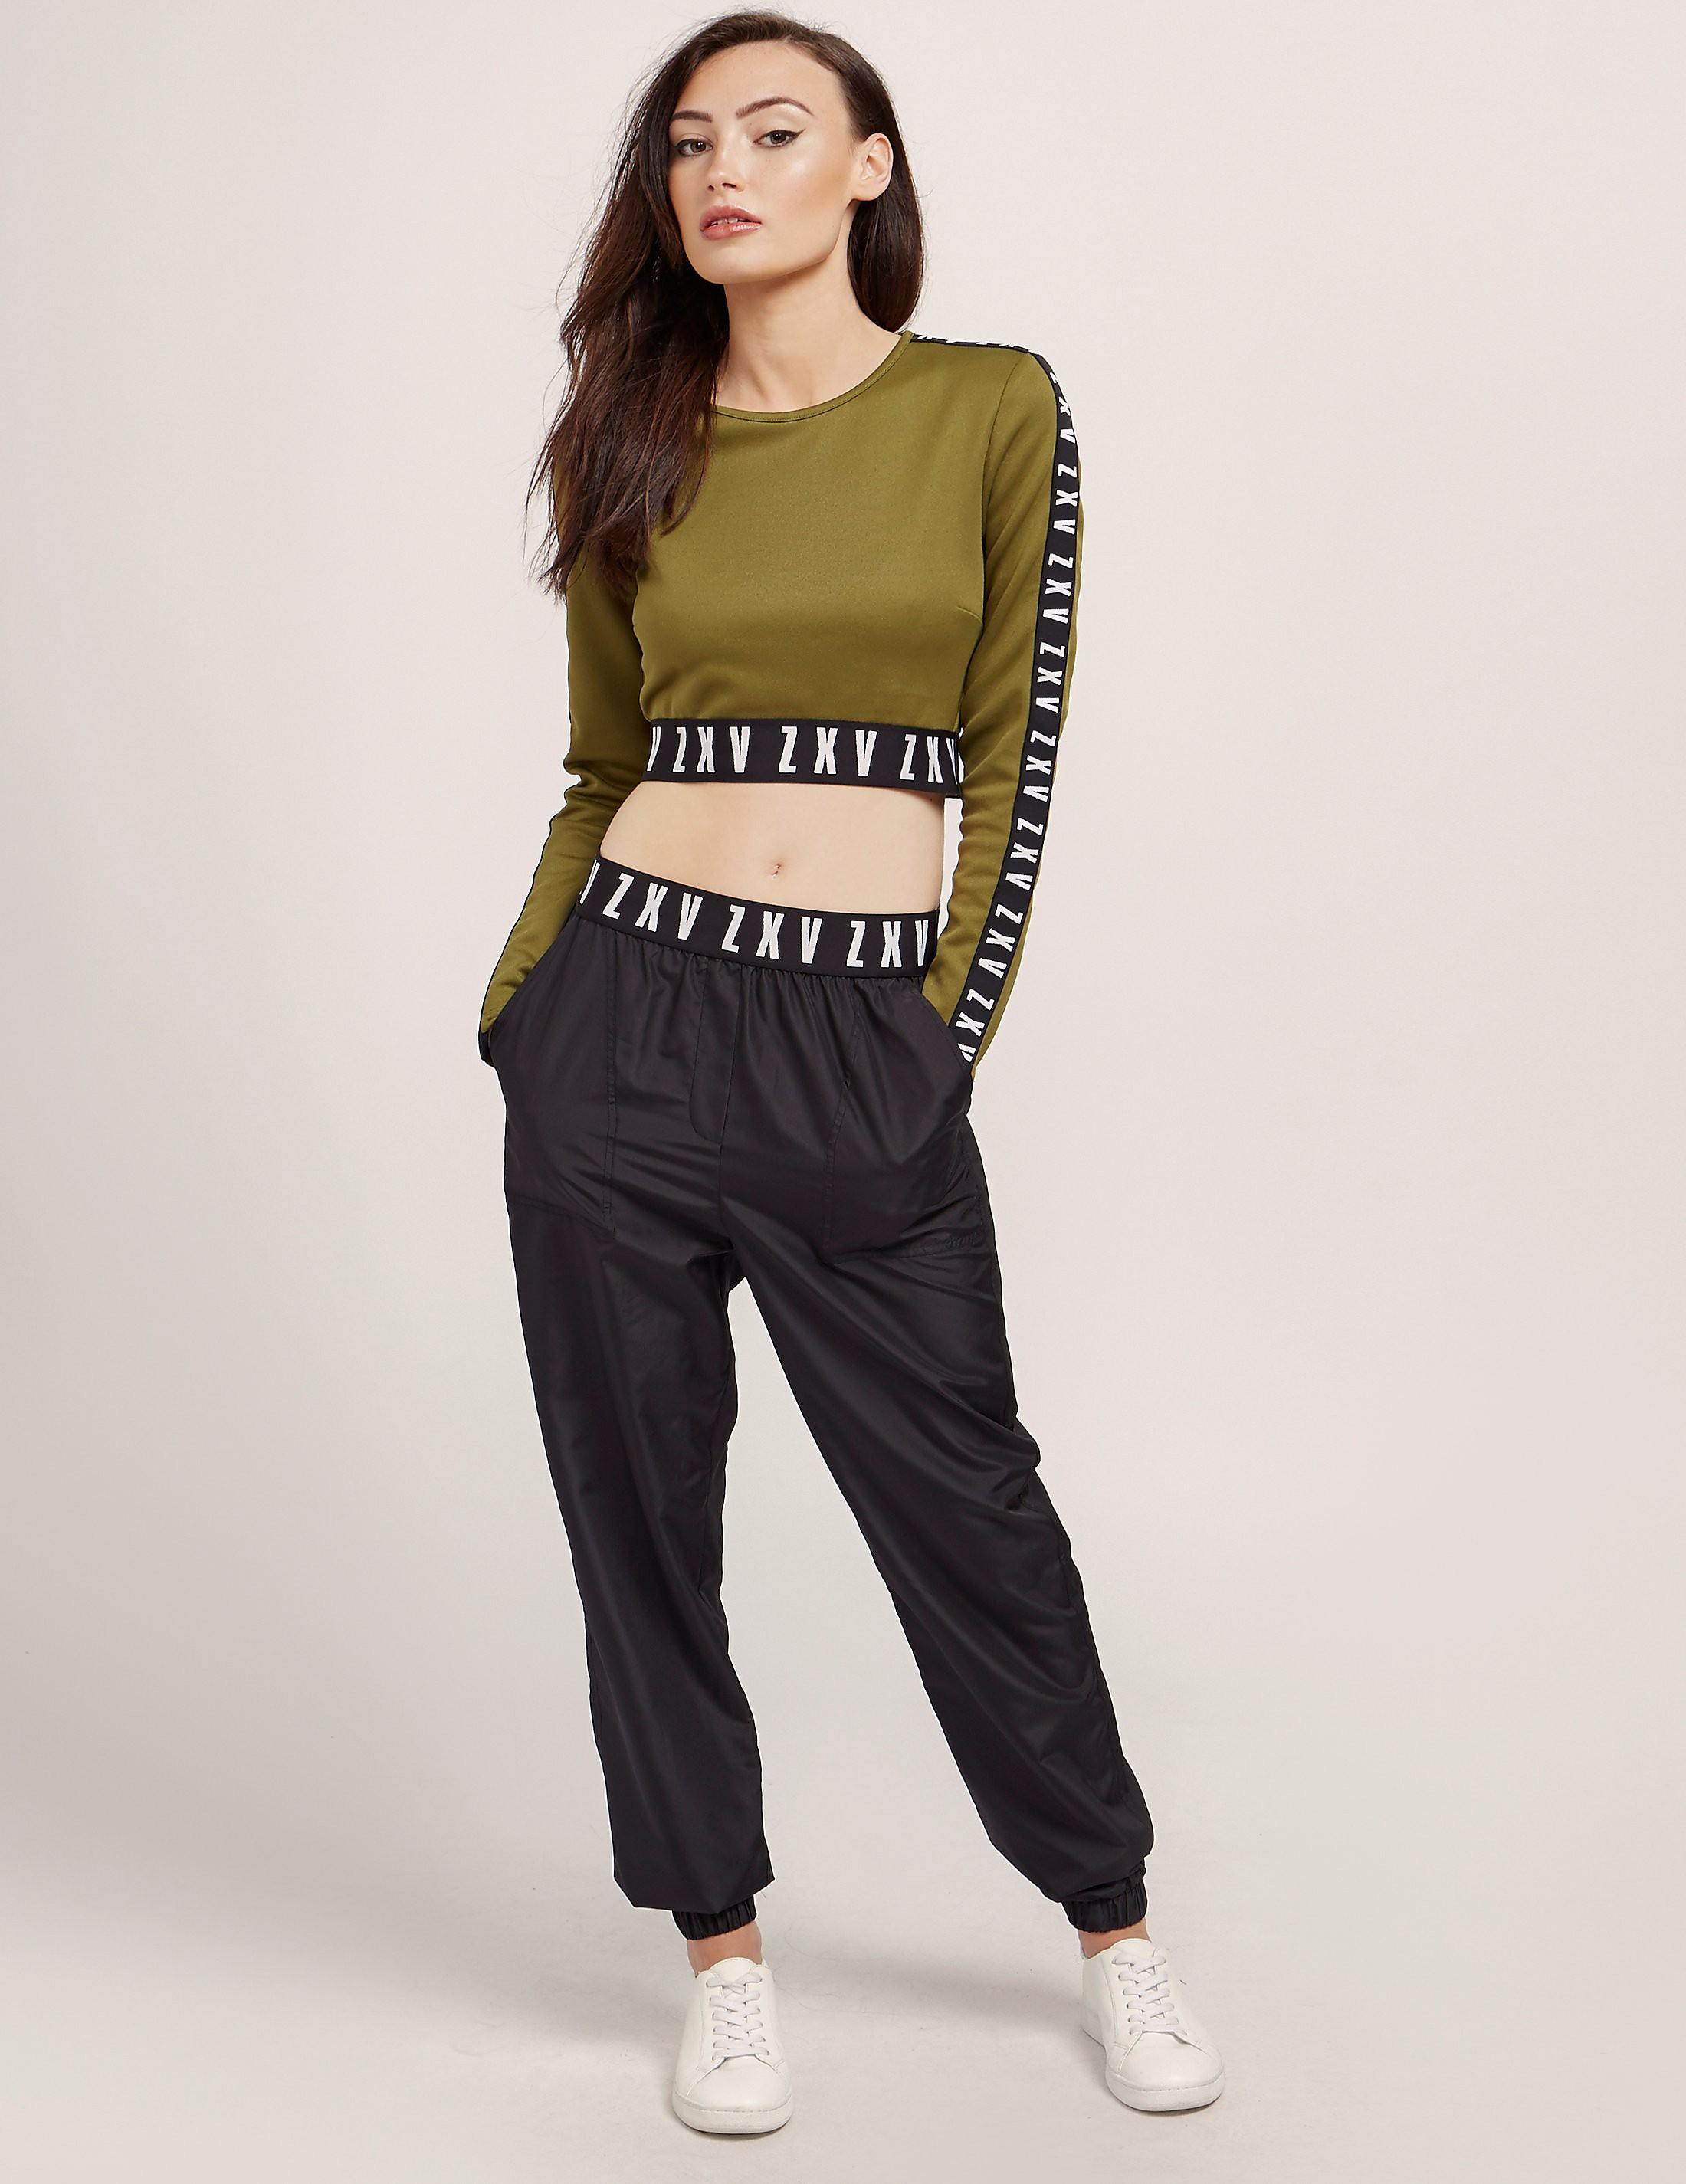 Versus Versace X Zayn Long Sleeve Crop Top